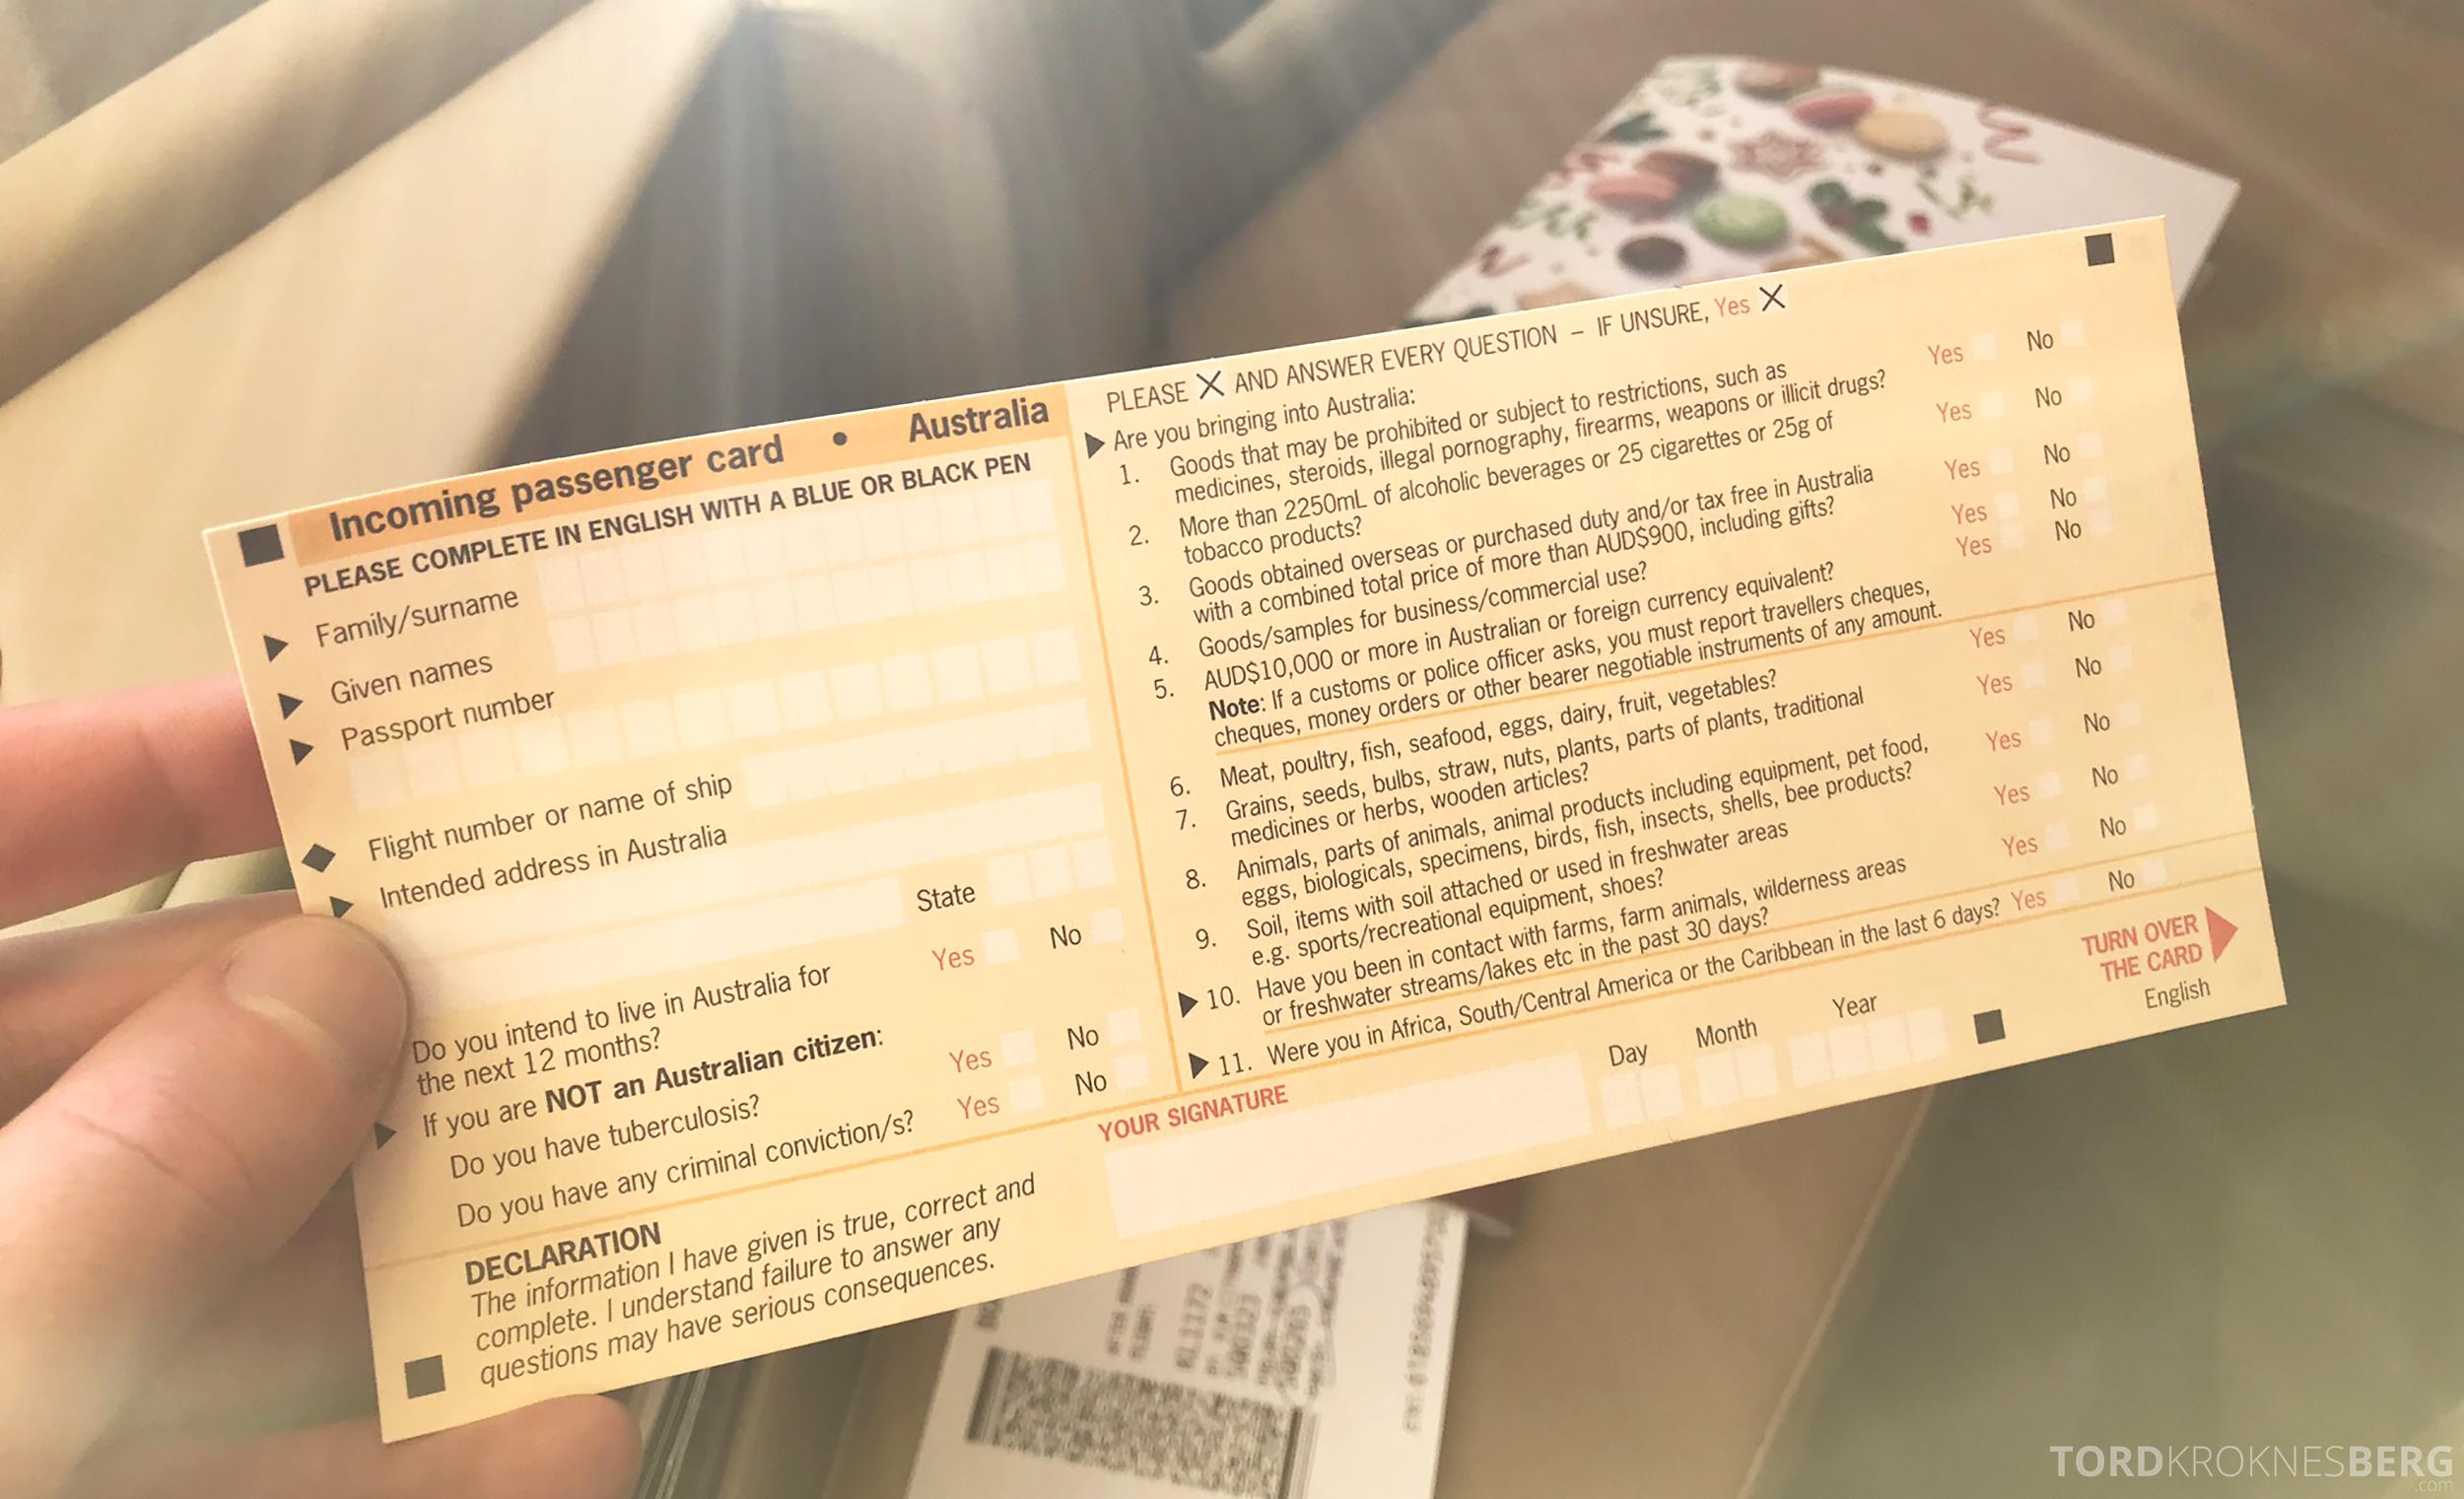 Singapore Airlines Business Class Brisbane immigrasjonskort